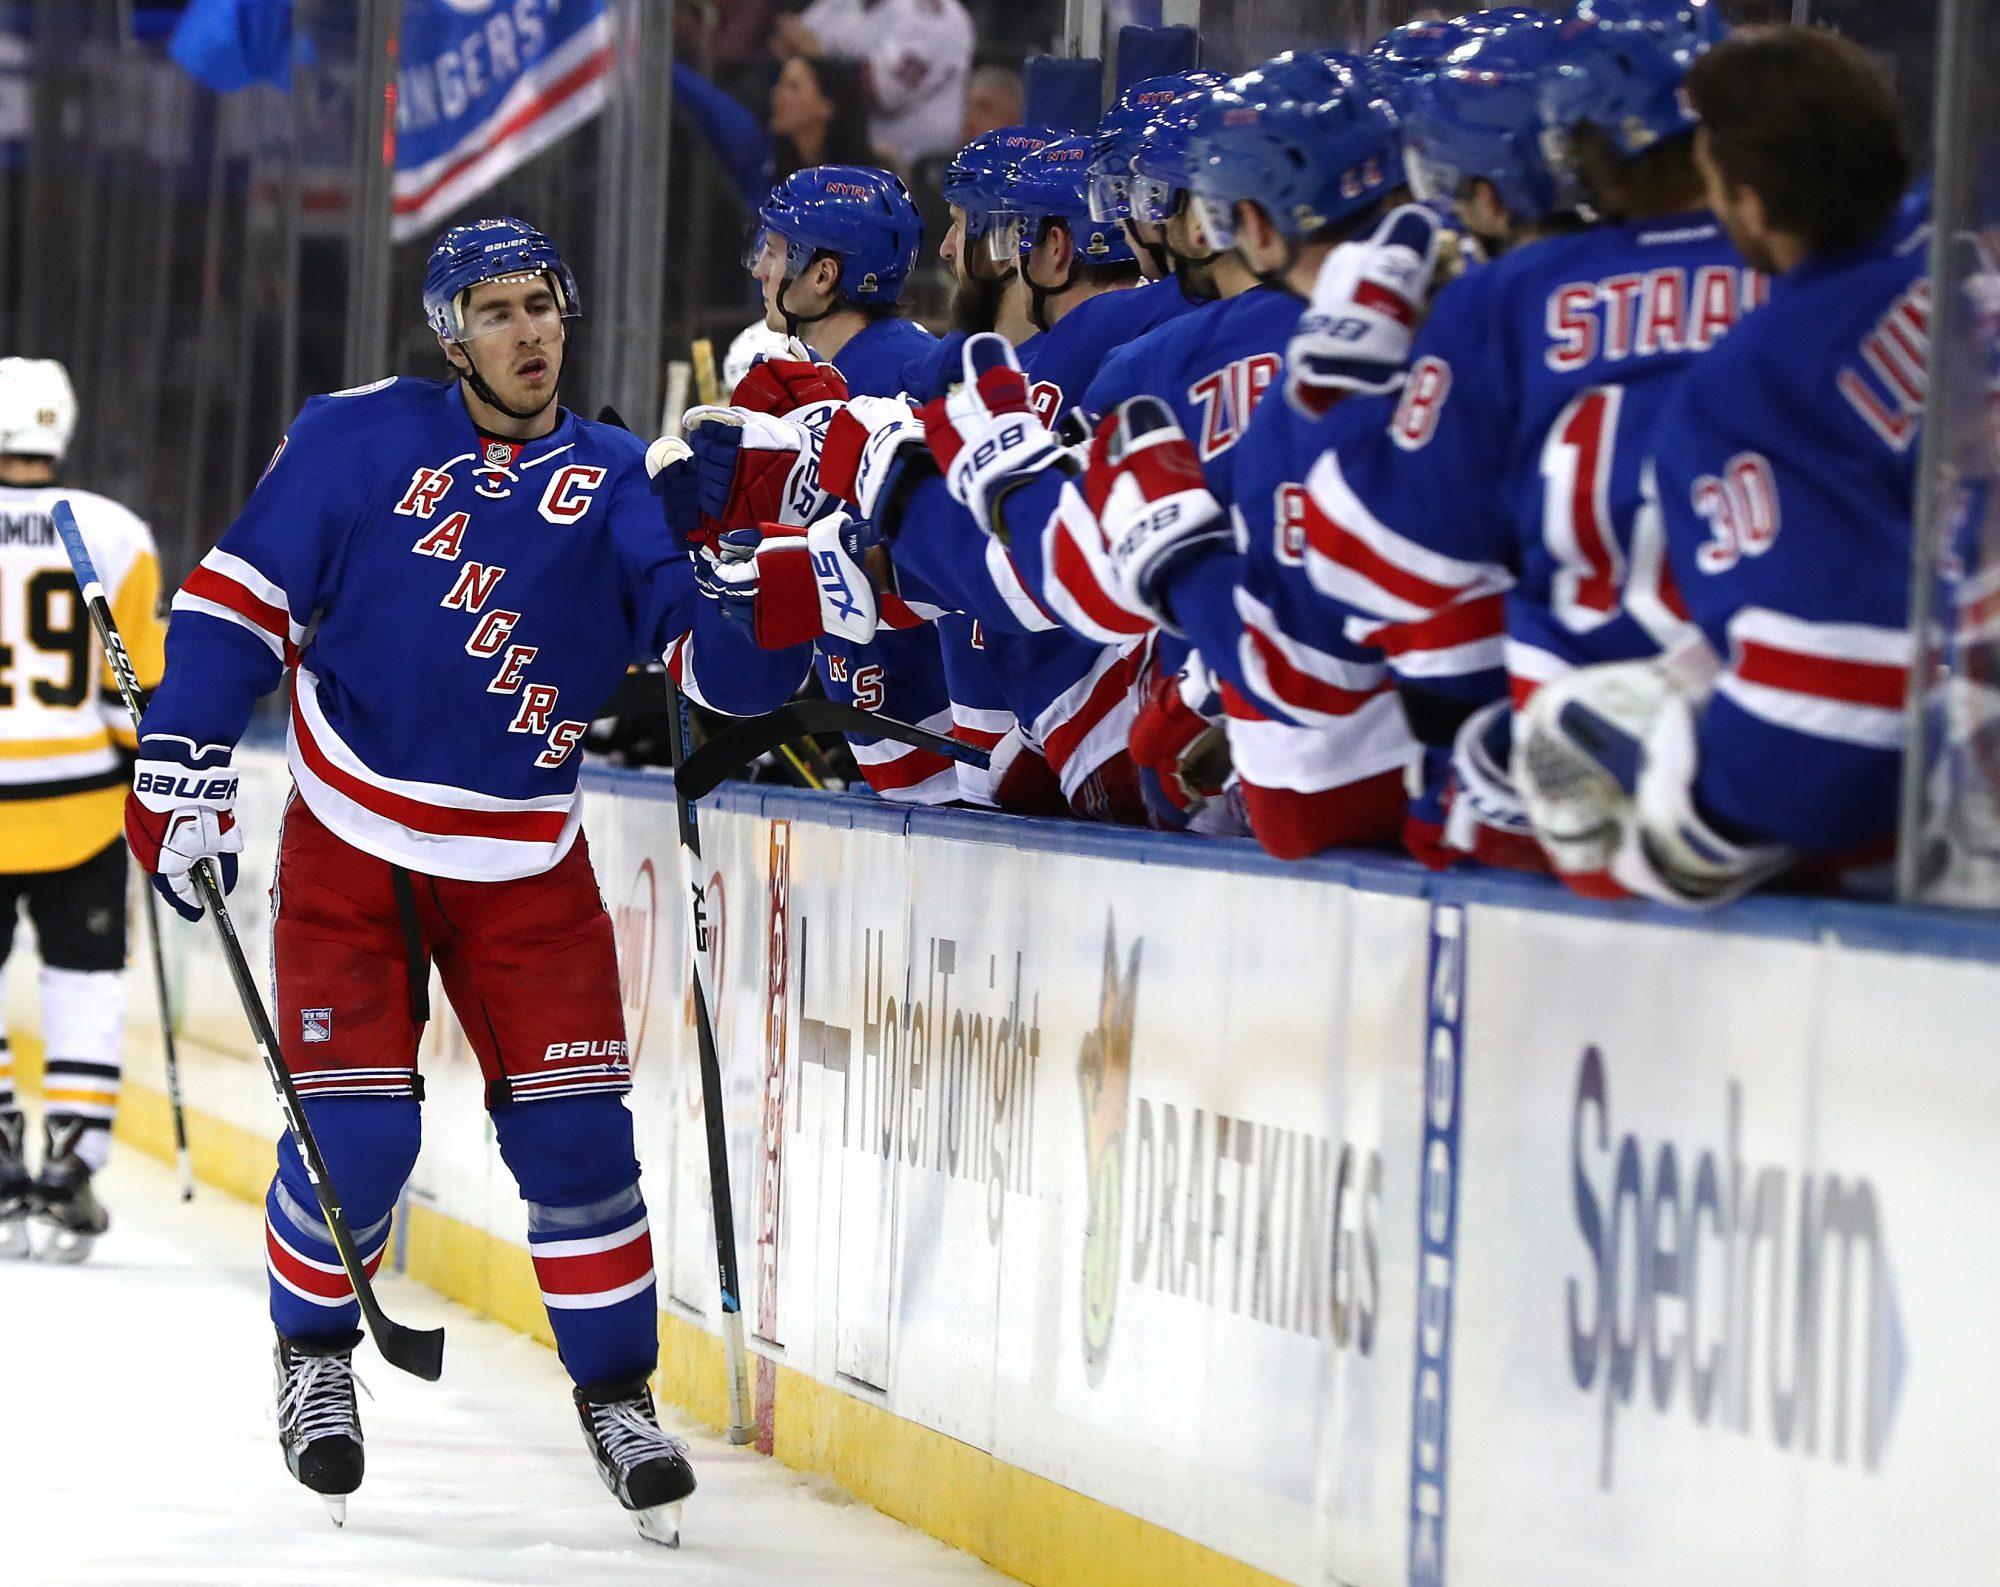 New York Rangers: Ryan McDonagh And Kevin Shattenkirk Named Top 20 Defensemen